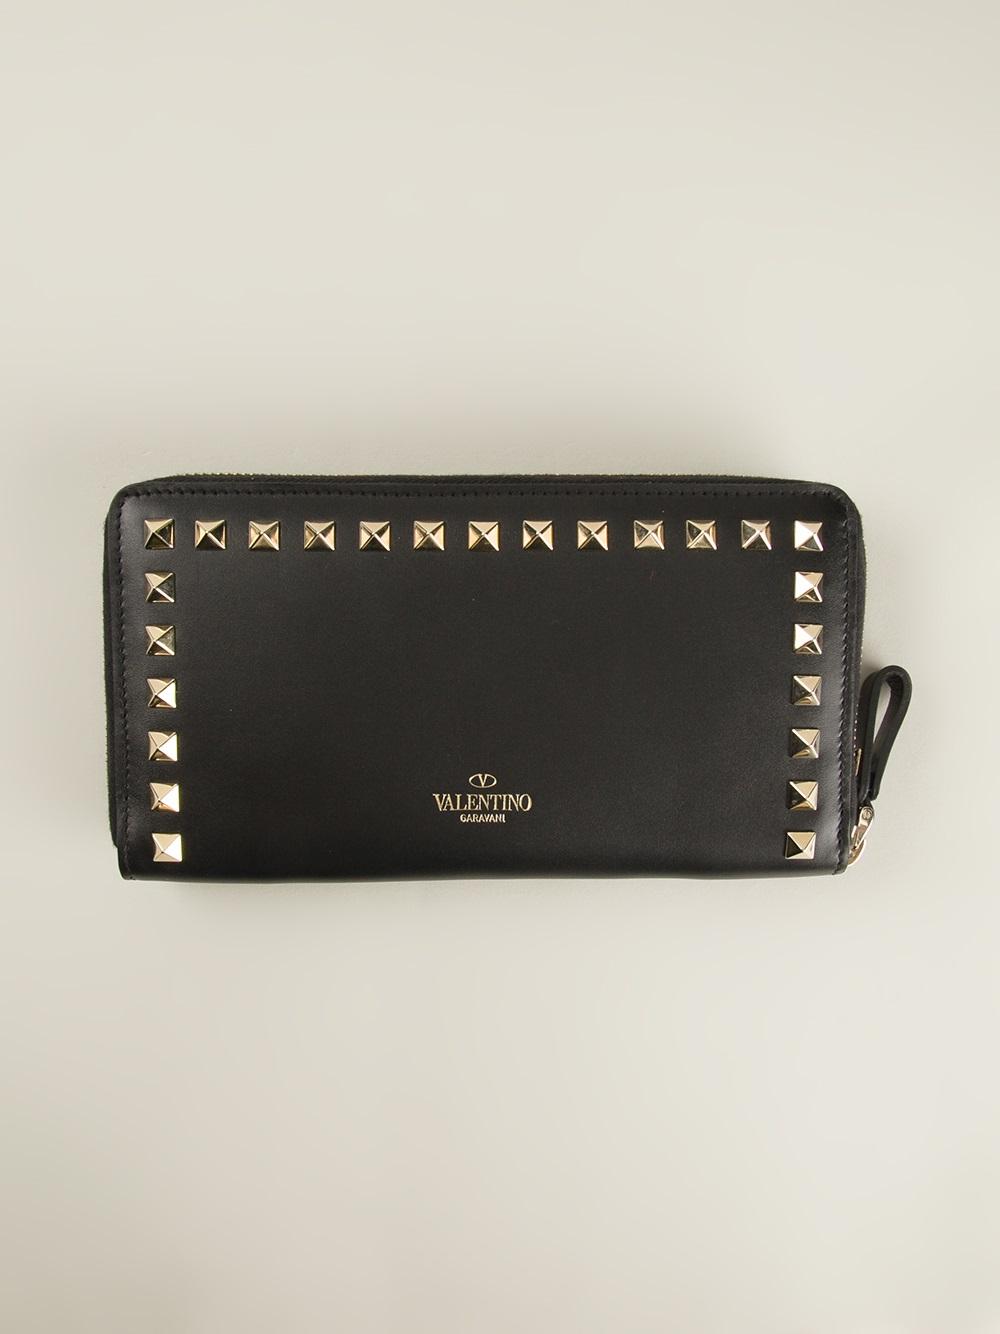 Valentino Garavani 'rockstud' Wallet in Black | Lyst